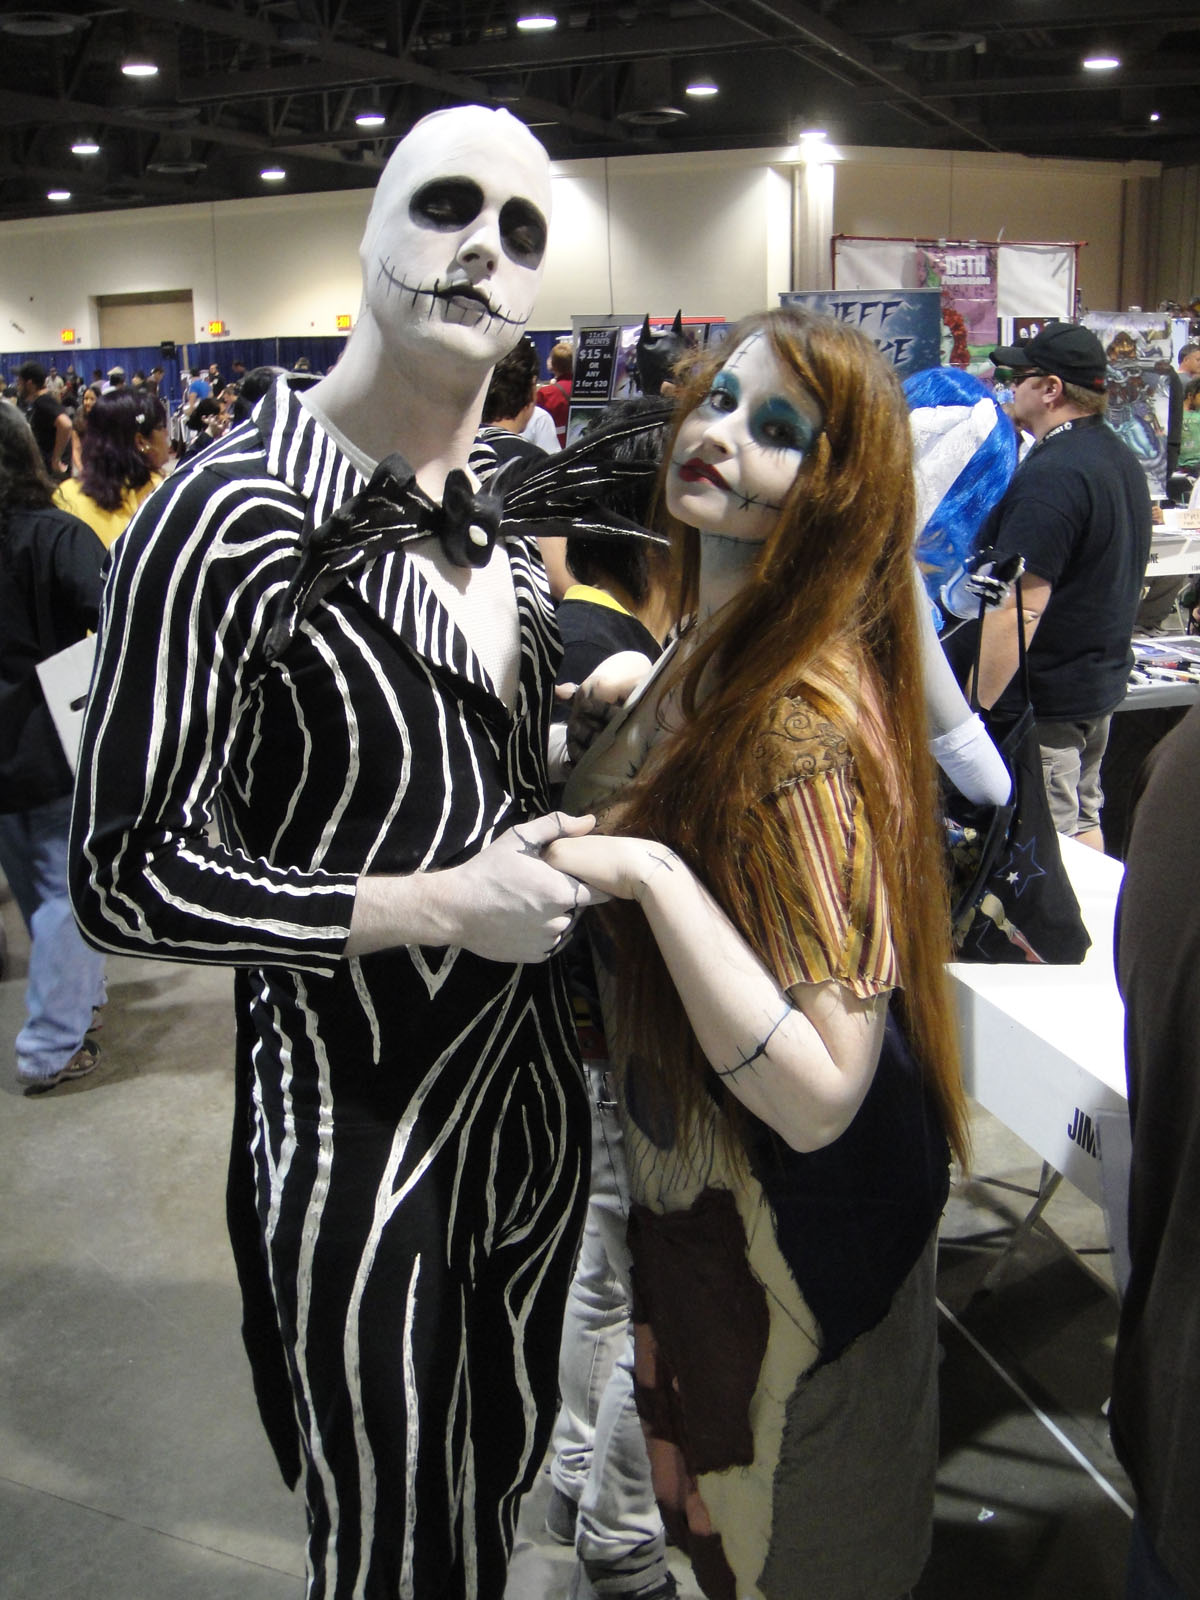 file:long beach comic & horror con 2011 - jack skellington and sally